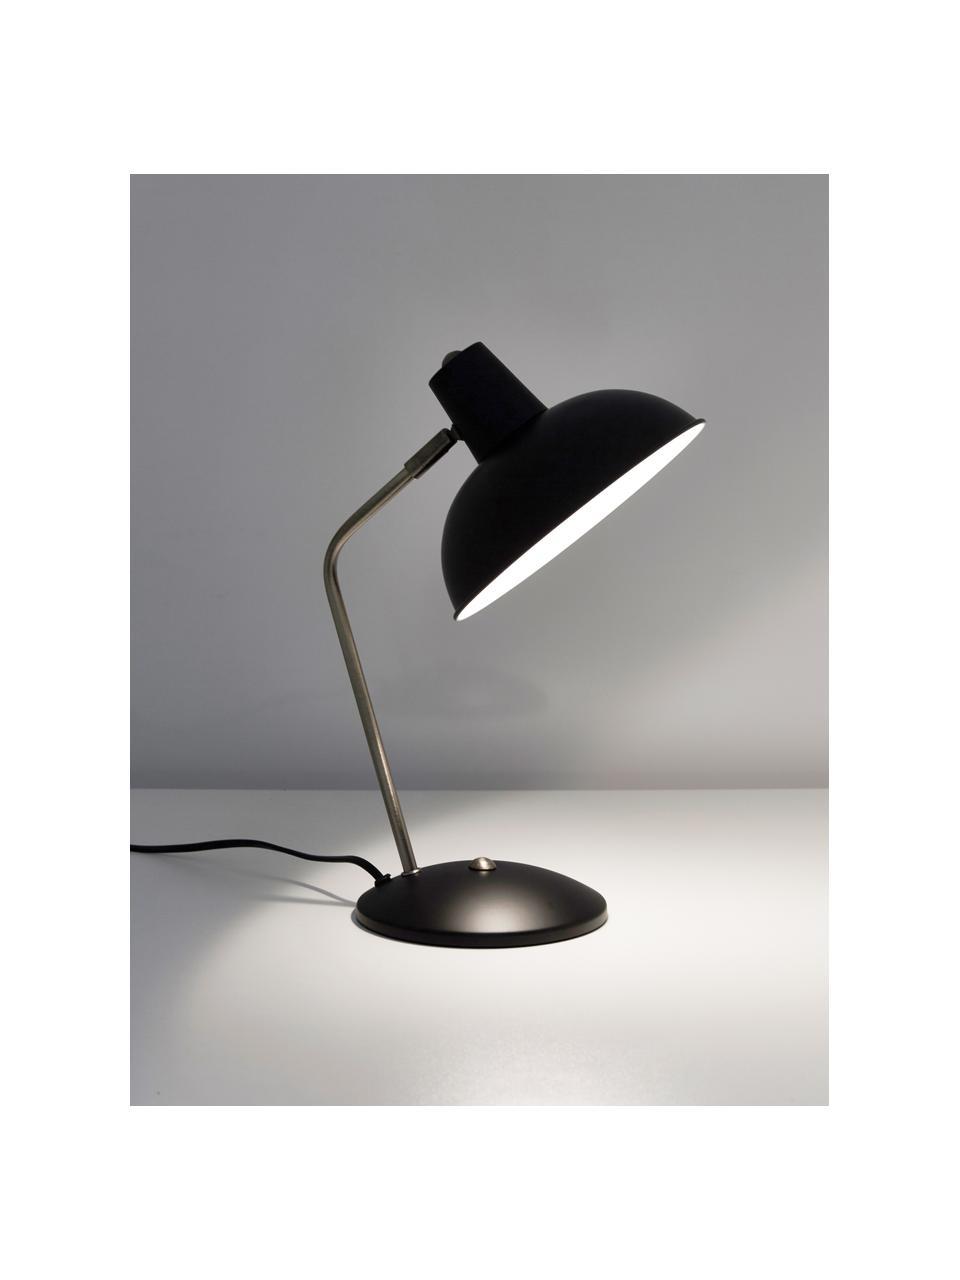 Retro-Schreibtischlampe Hood, Lampenschirm: Metall, lackiert, Lampenfuß: Metall, lackiert, Leuchte: Schwarz, Messingfarben Lampenschirm innen: Weiß, 20 x 38 cm